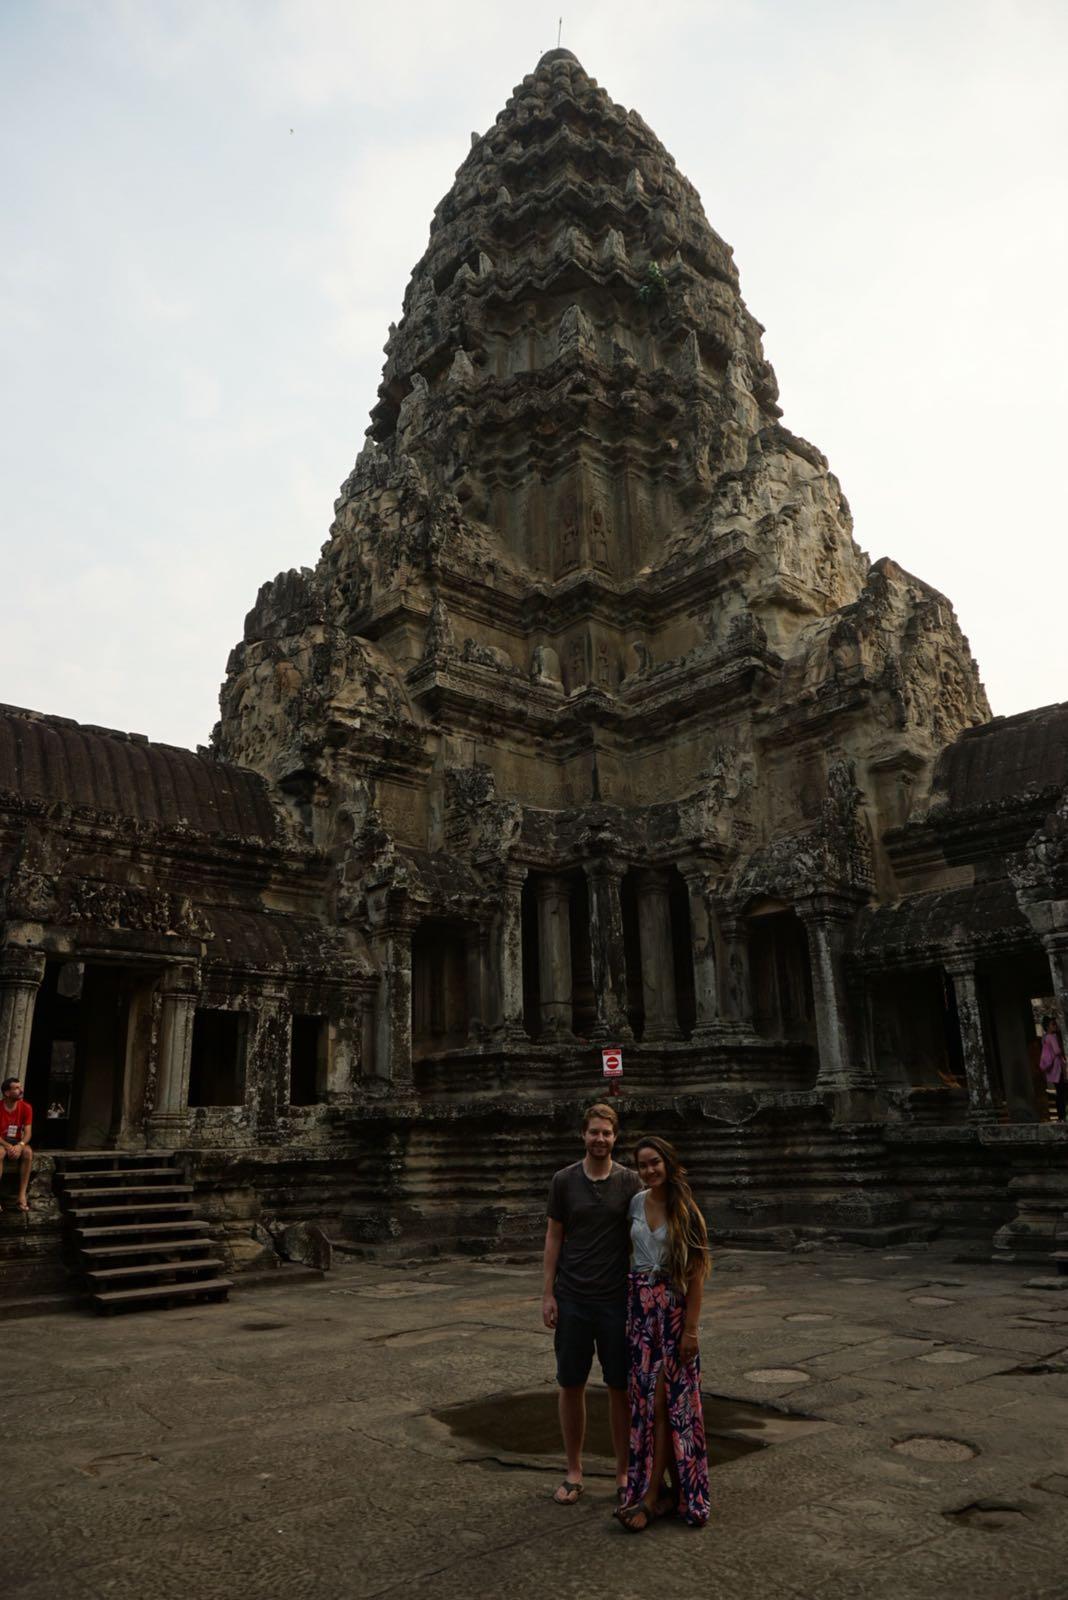 Inside Angkor Wat looking at one of the pillars